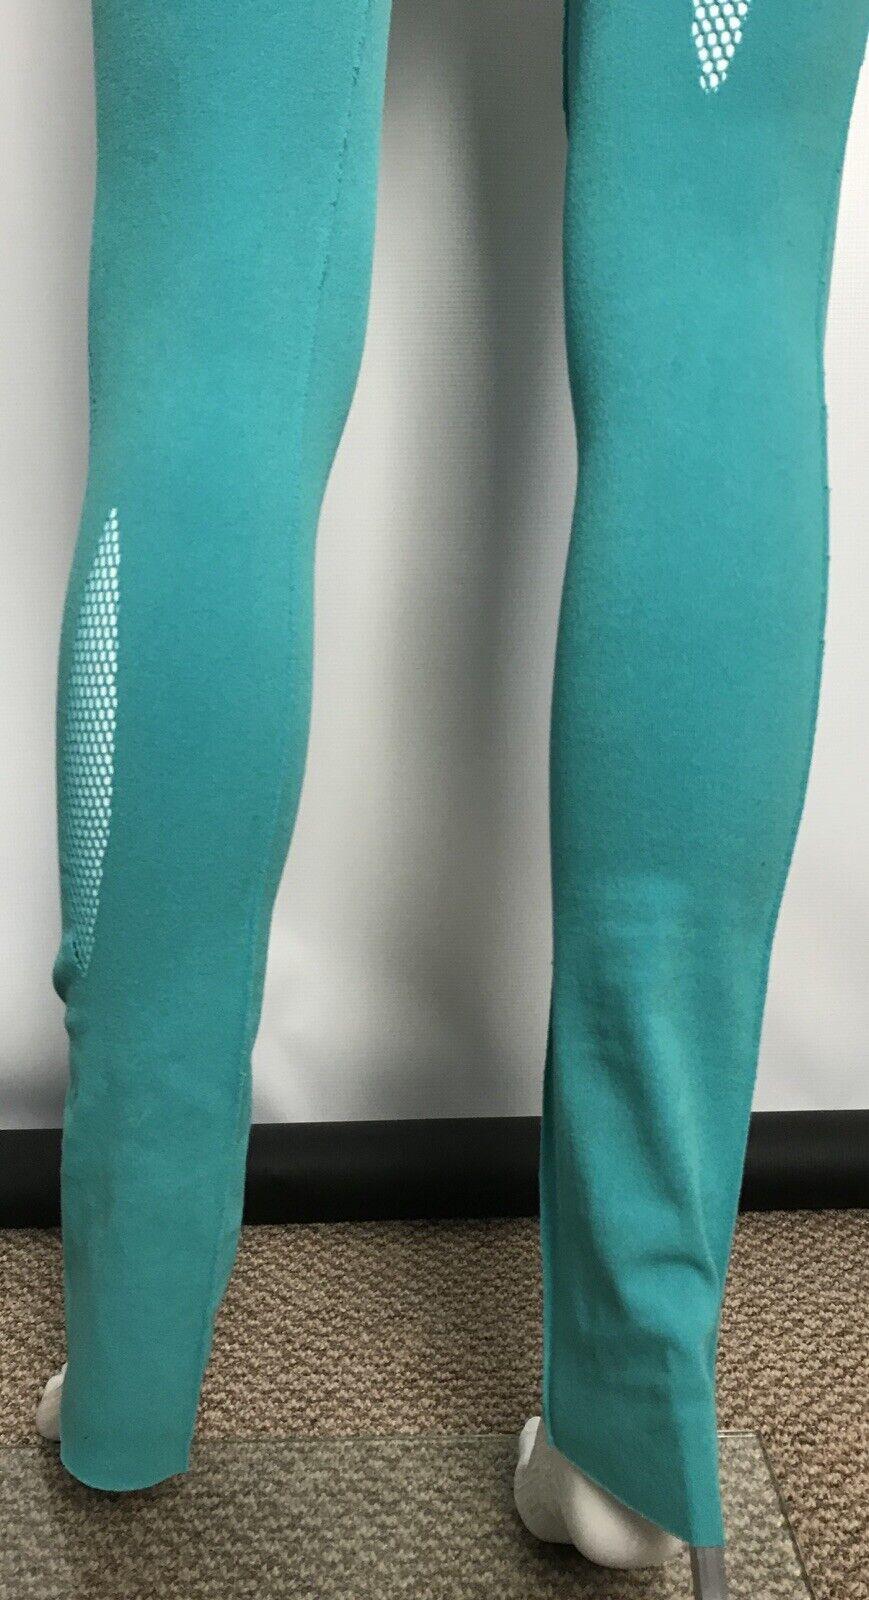 Issey Miyake Pantaloni Pantaloni Pantaloni Leggings Ottimo Pezzo 49452d